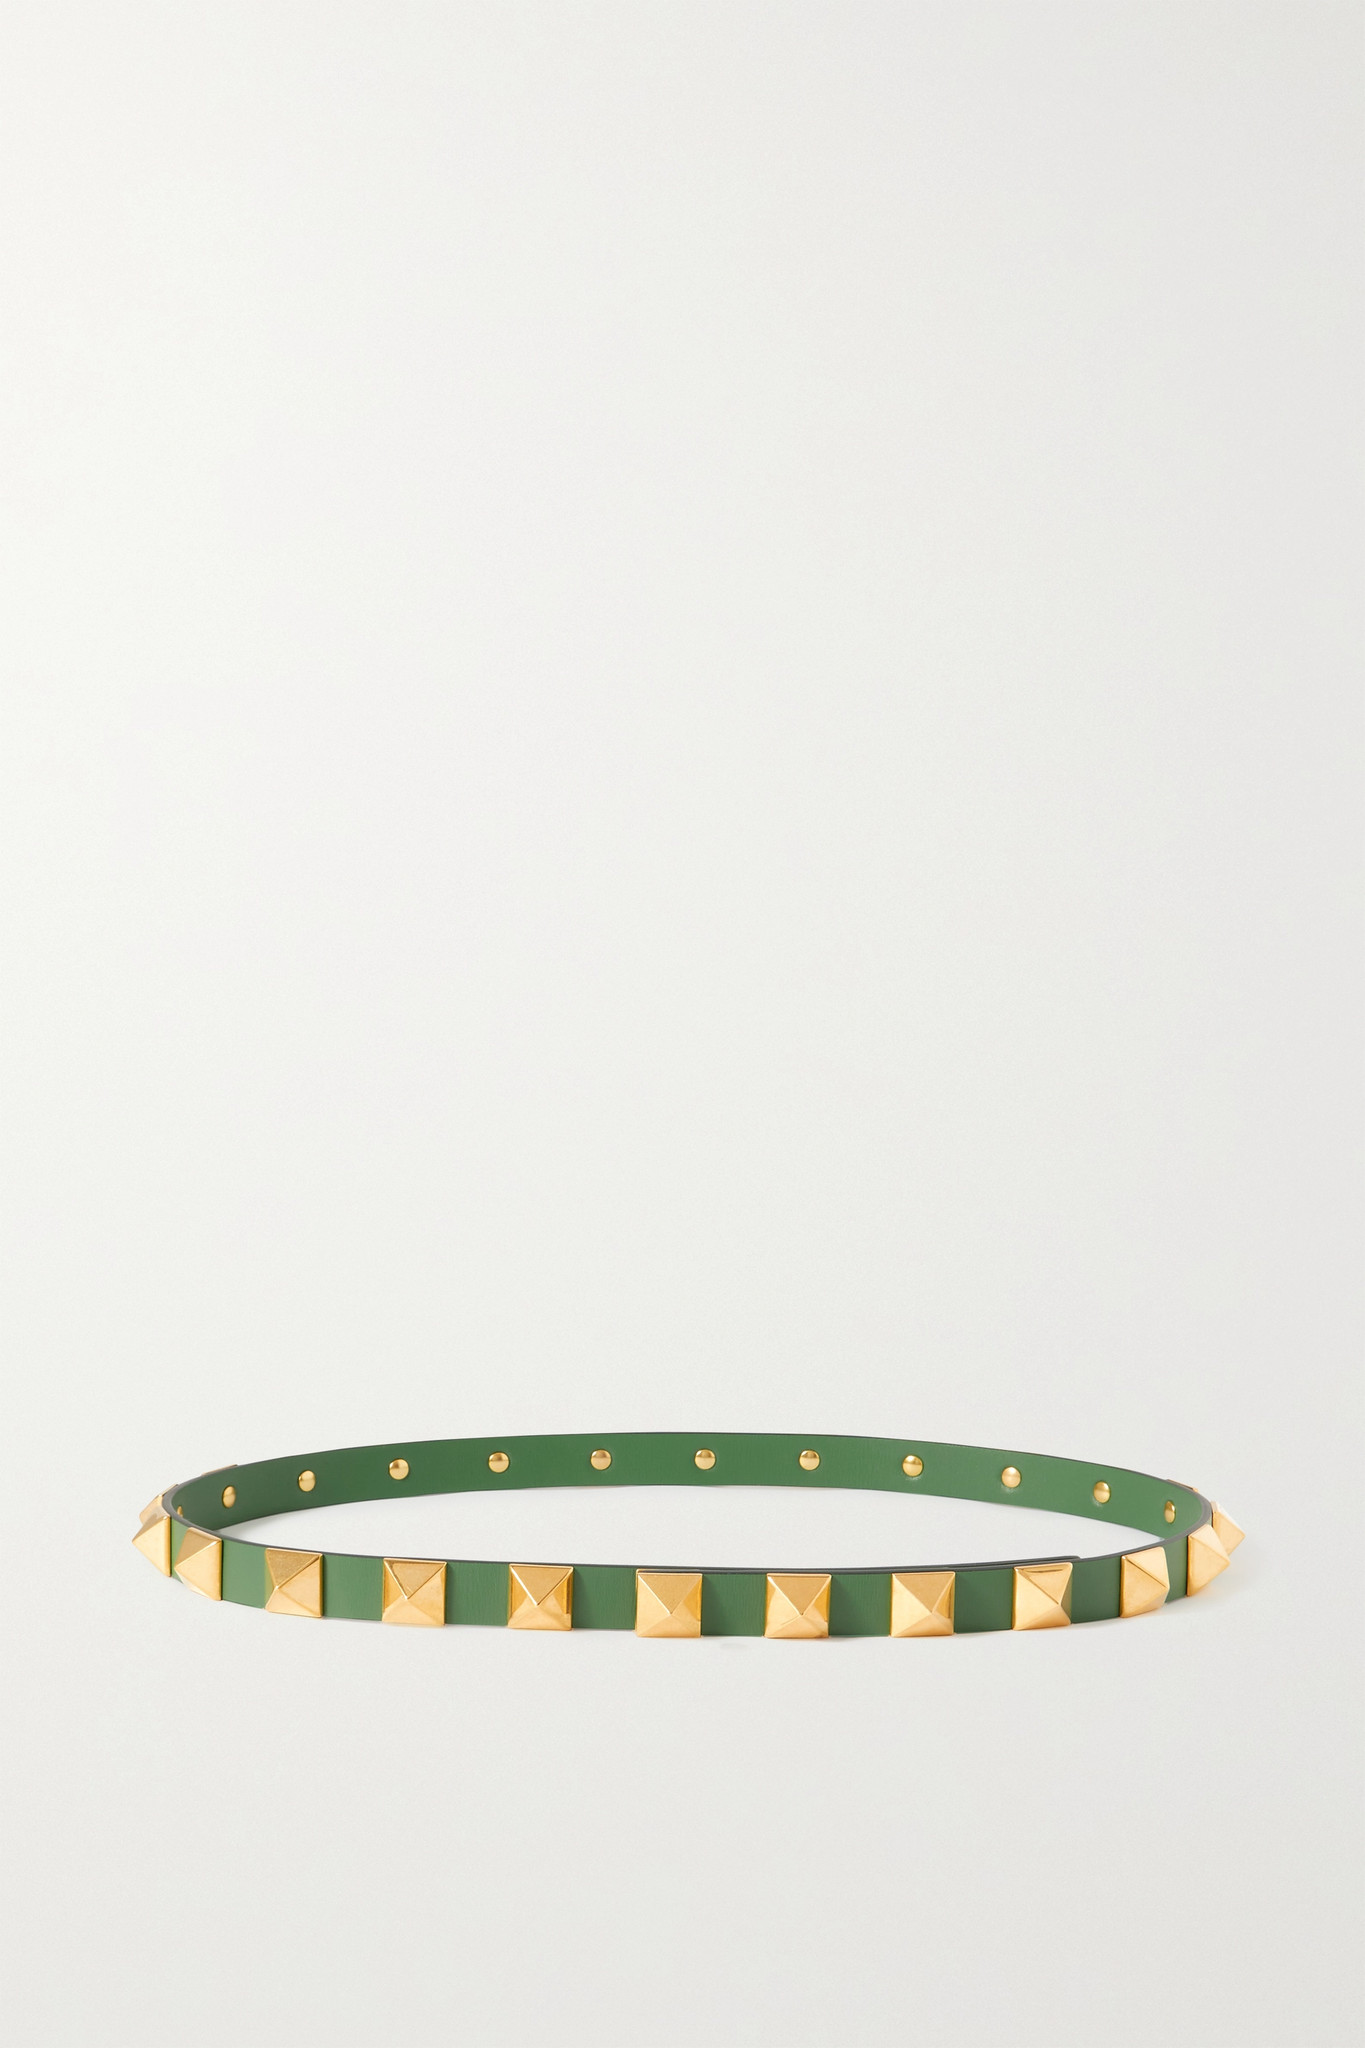 VALENTINO - Valentino Garavani Rockstud Leather Waist Belt - Green - 70